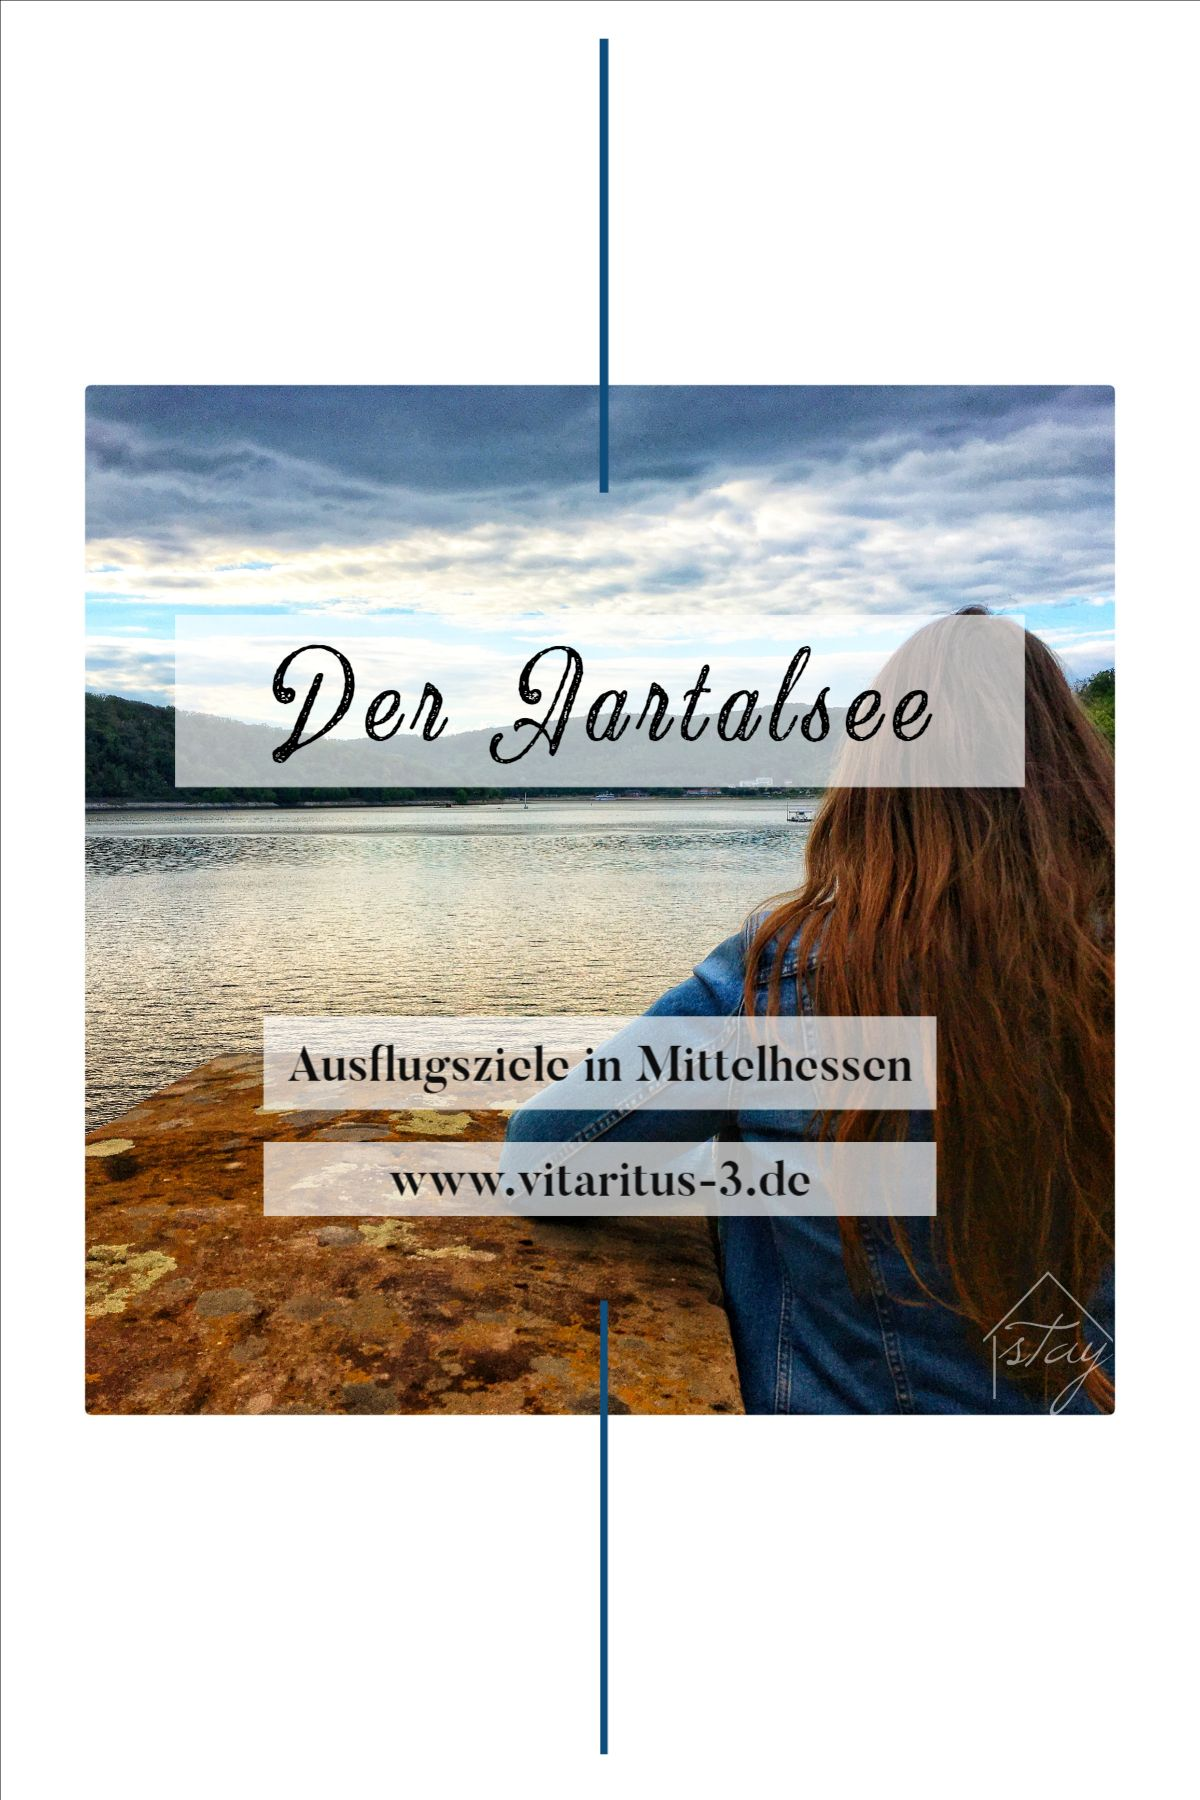 Ausflugsziele Mittelhessen